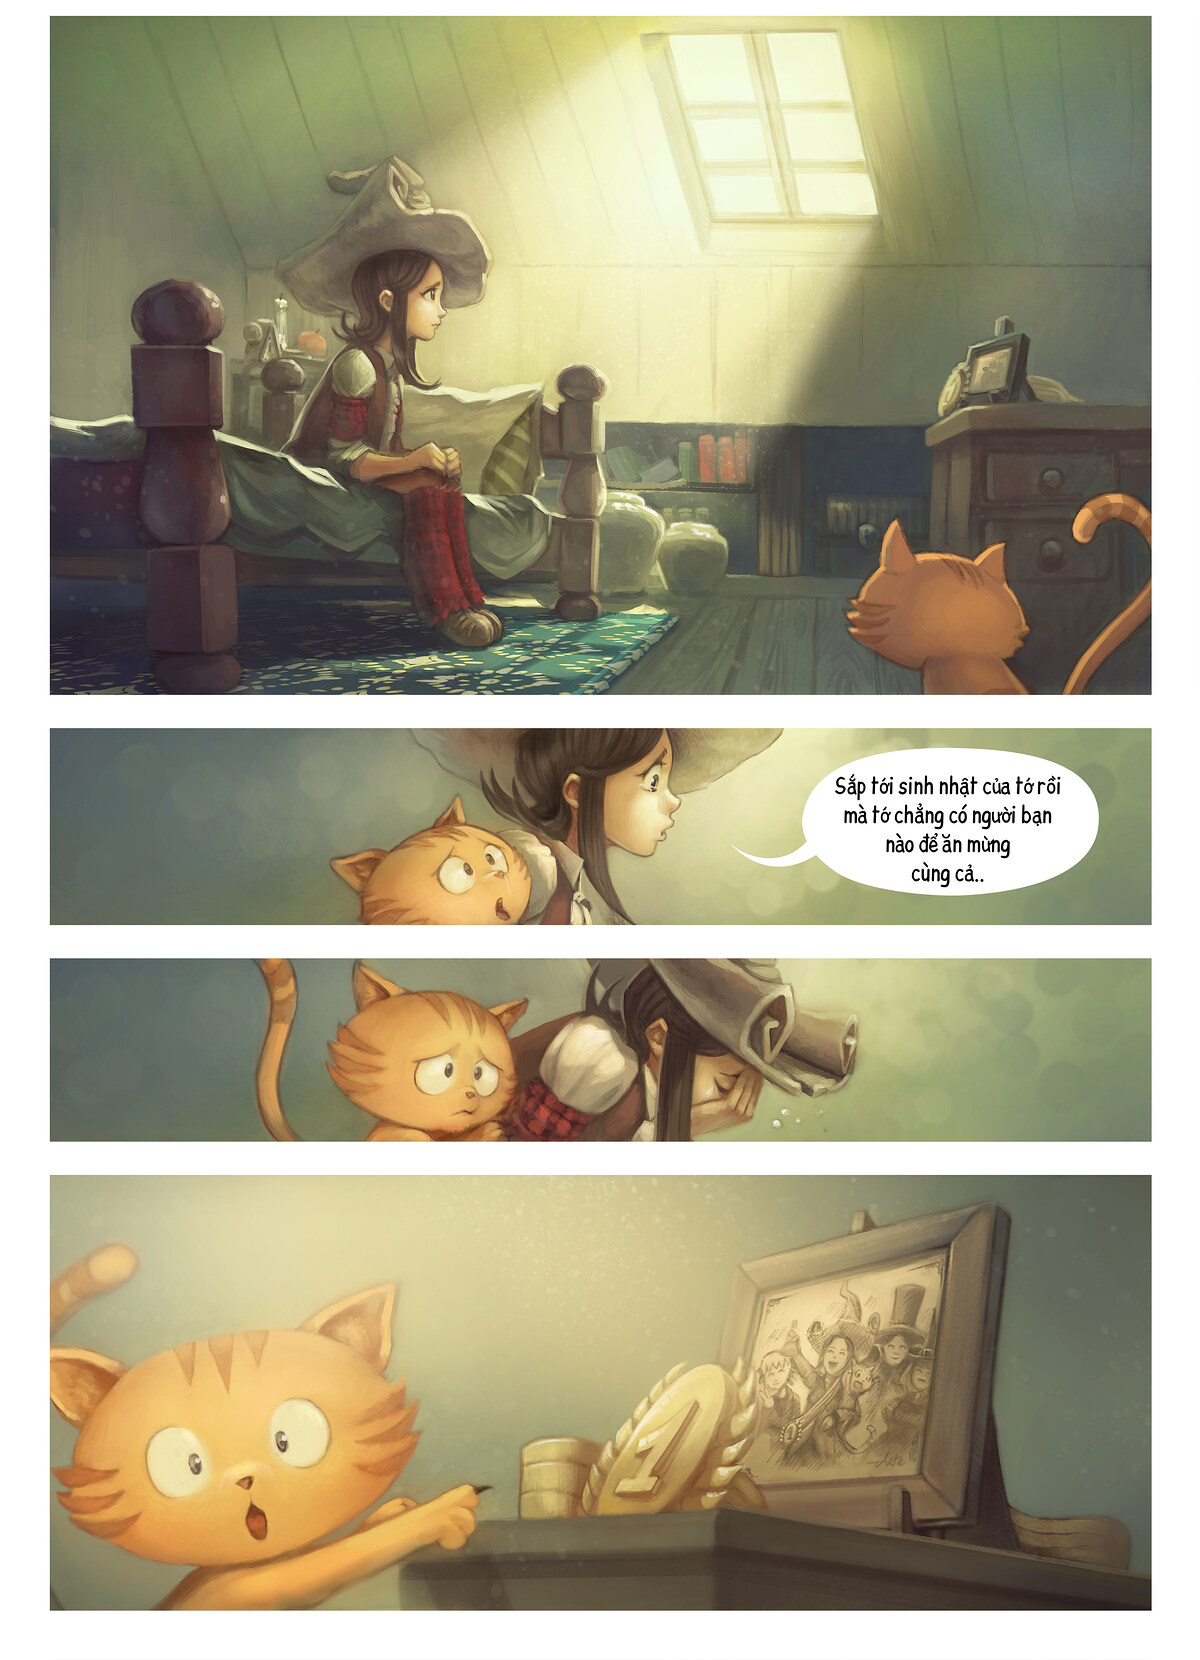 A webcomic page of Pepper&Carrot, Tập 8 [vi], trang 1